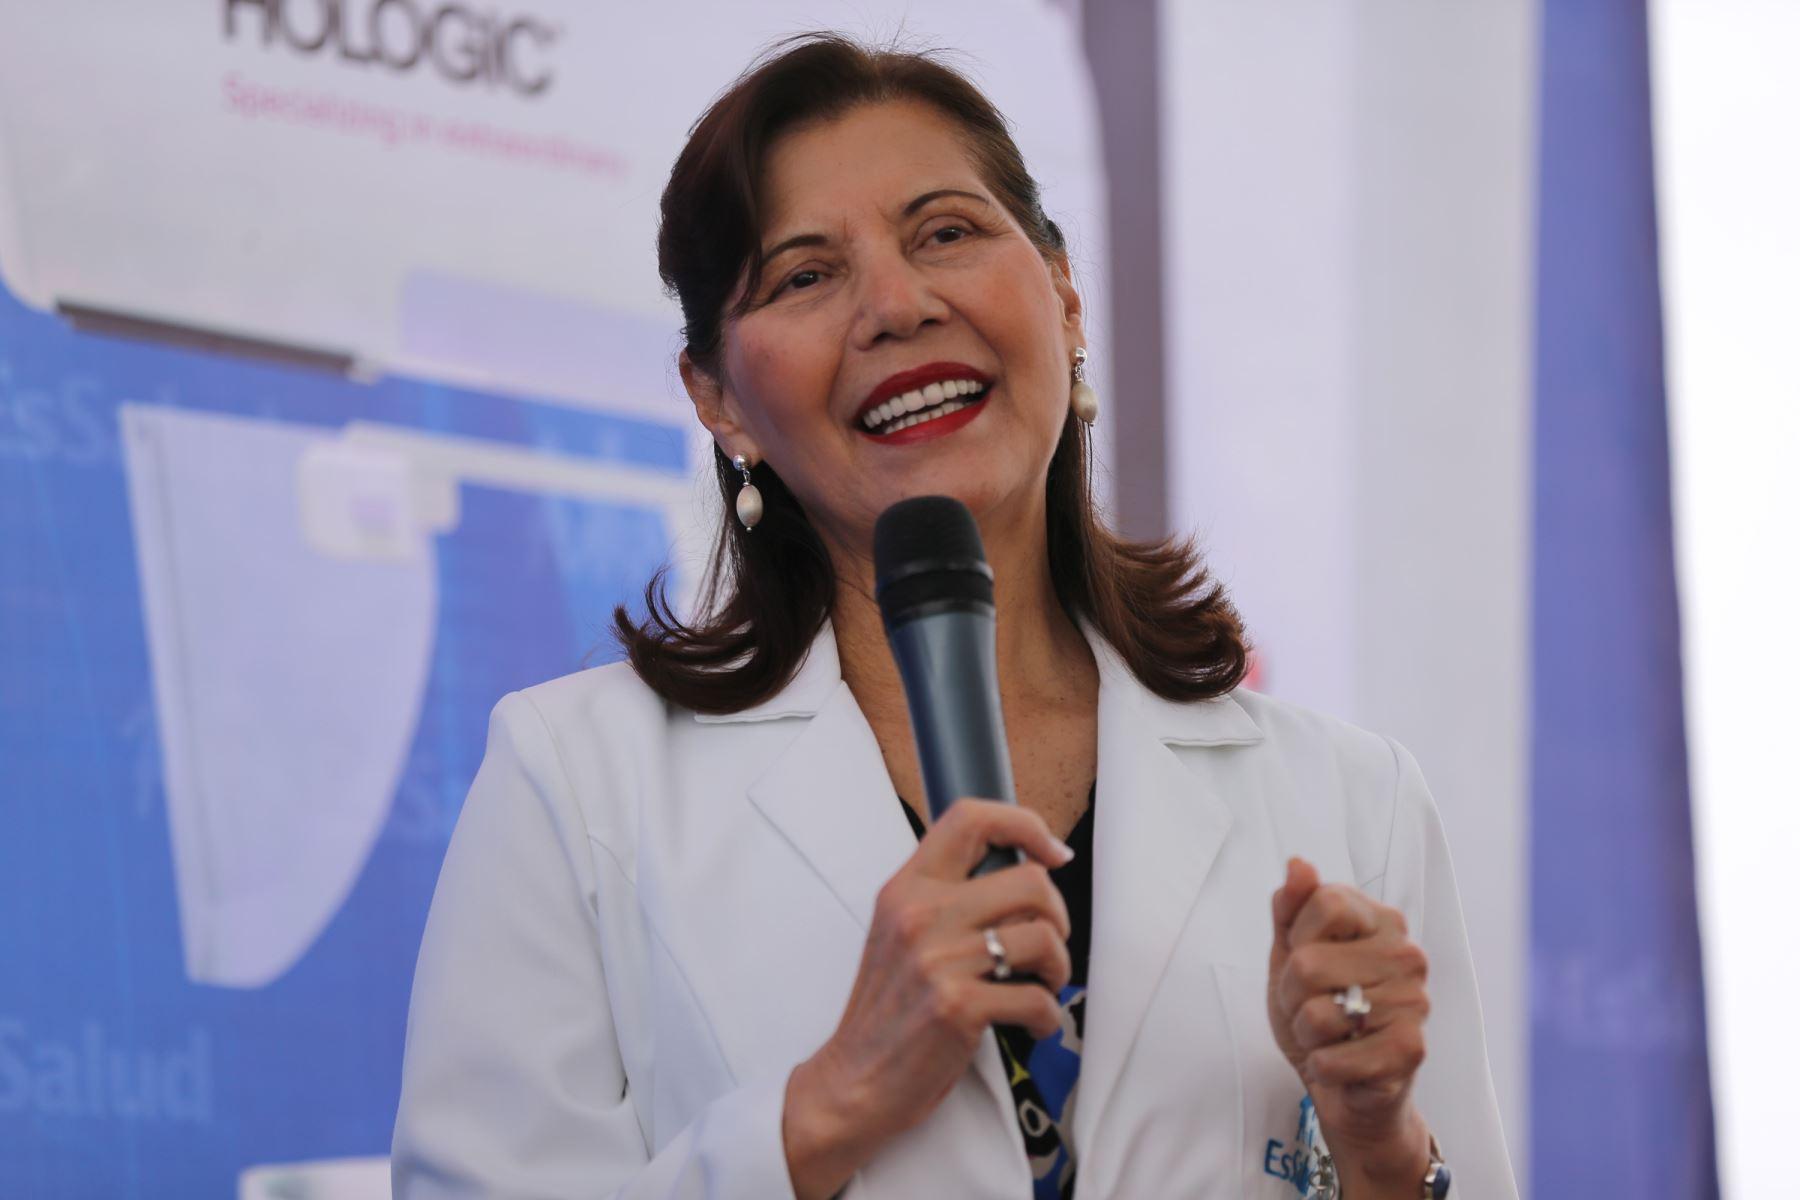 Presidenta de Essalud, Virginia Baffigo. Foto: ANDINA/Norman Córdova